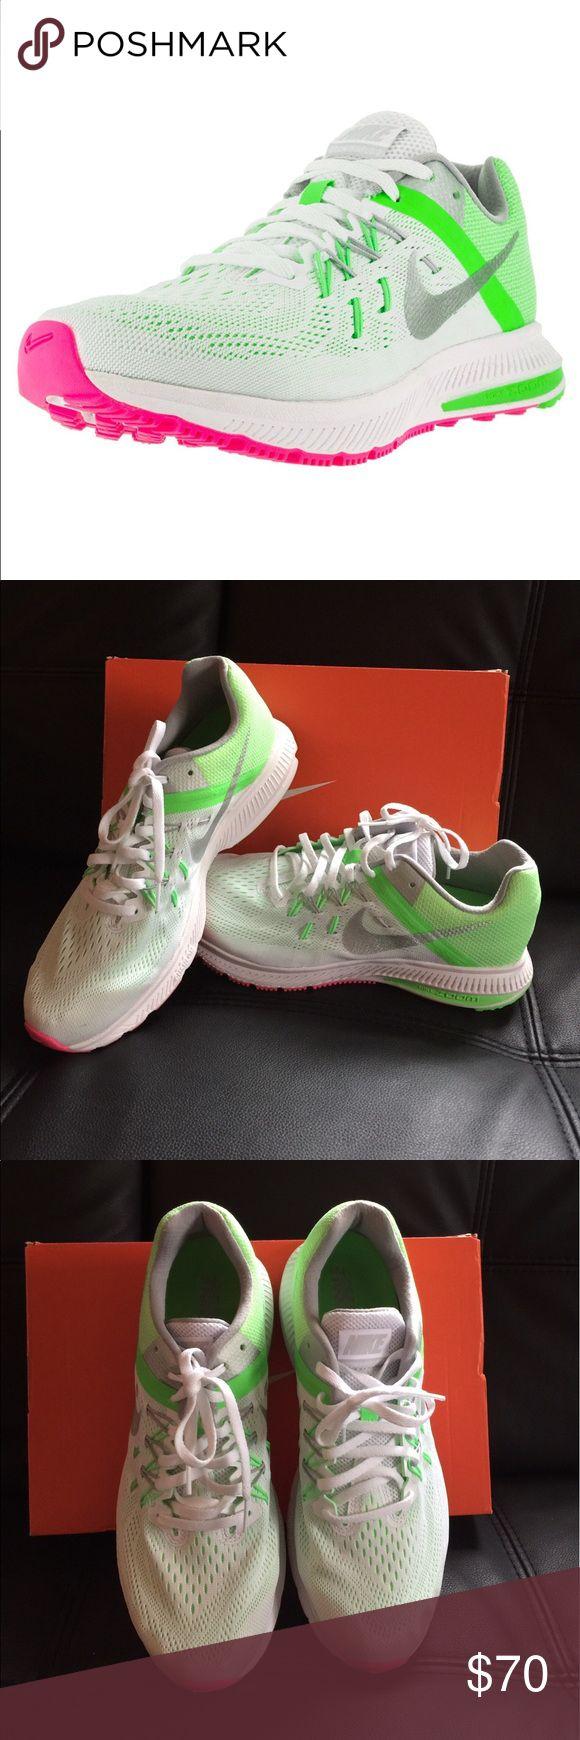 Women's Zoom Winflo 2 Running Shoe size 7 nwb Brand new retail $90 Nike Shoes Sneakers